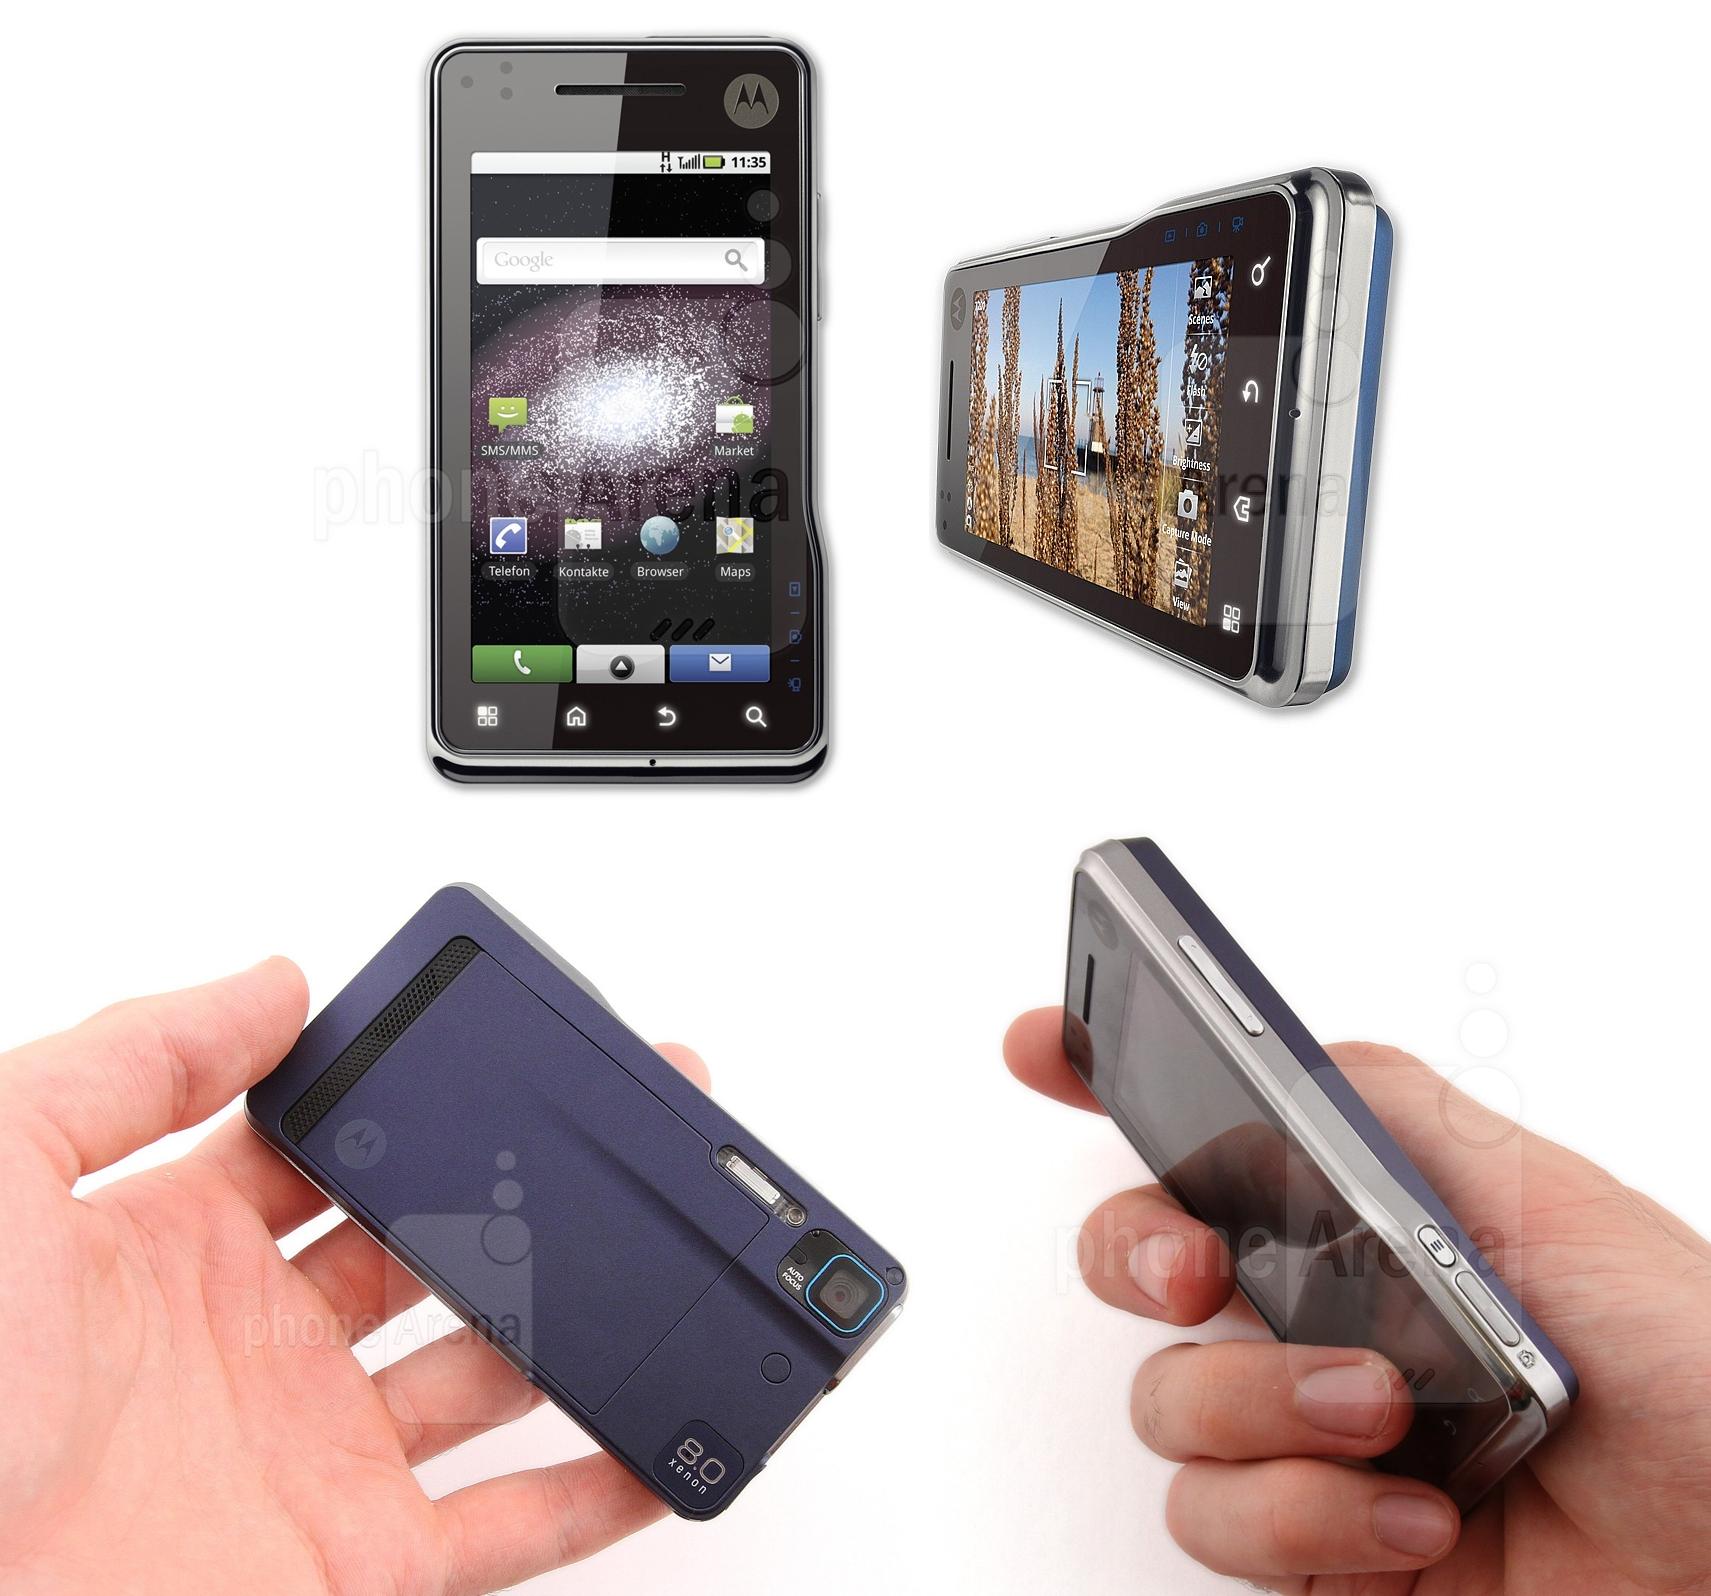 Motorola-weird-phones-09-Milestone-XT720